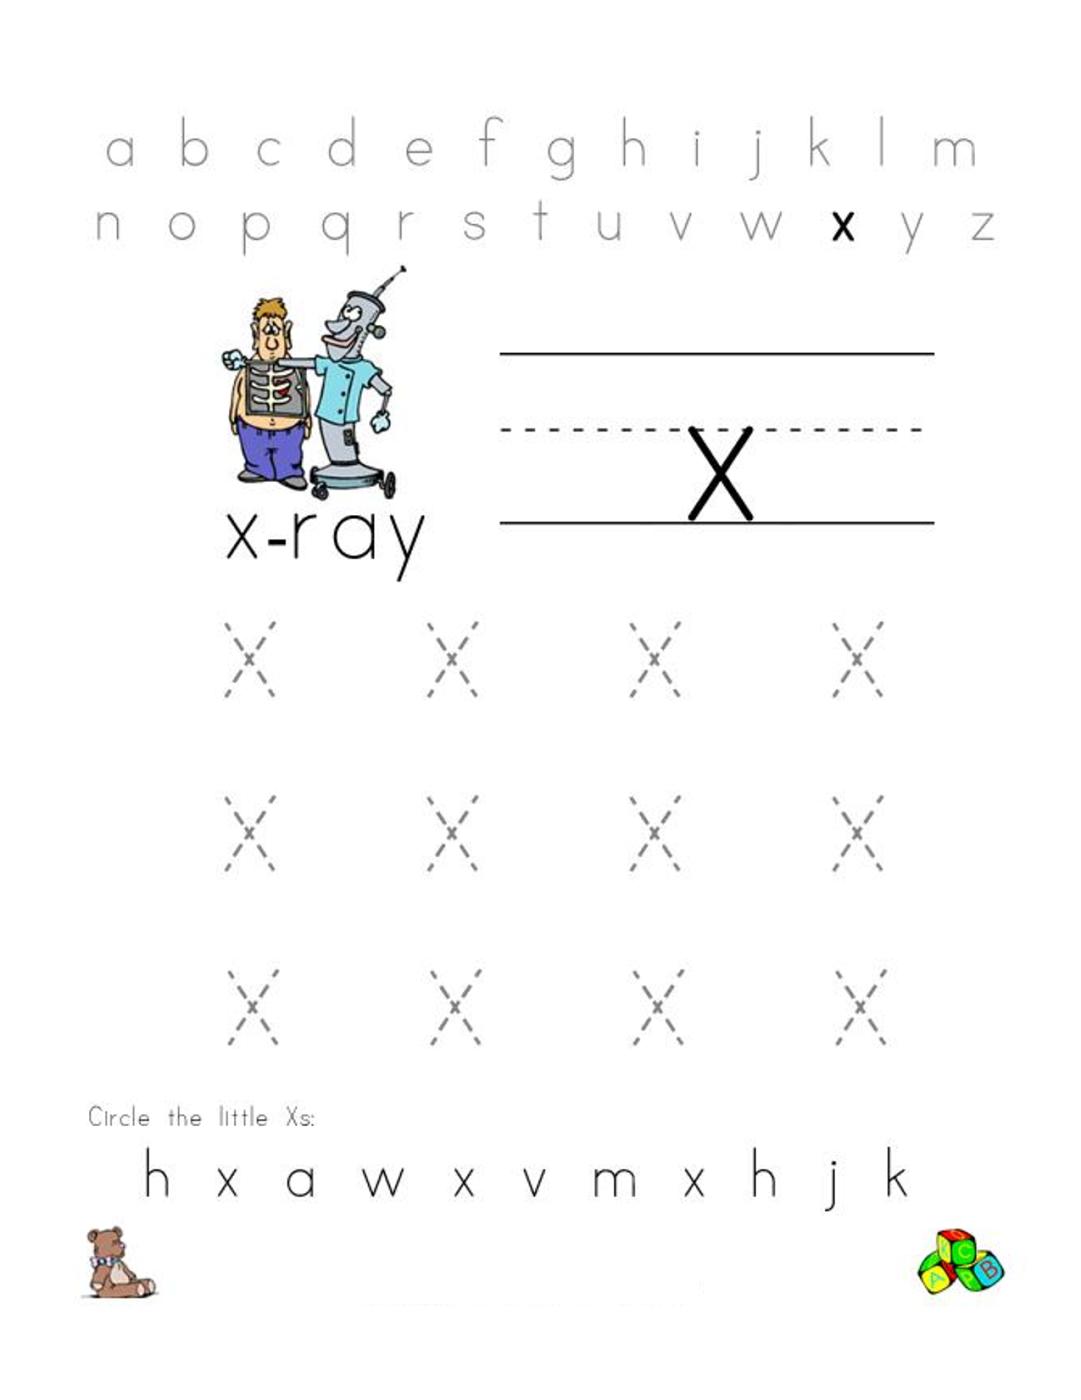 English Alphabet Worksheet for Kindergarten | Activity Shelter